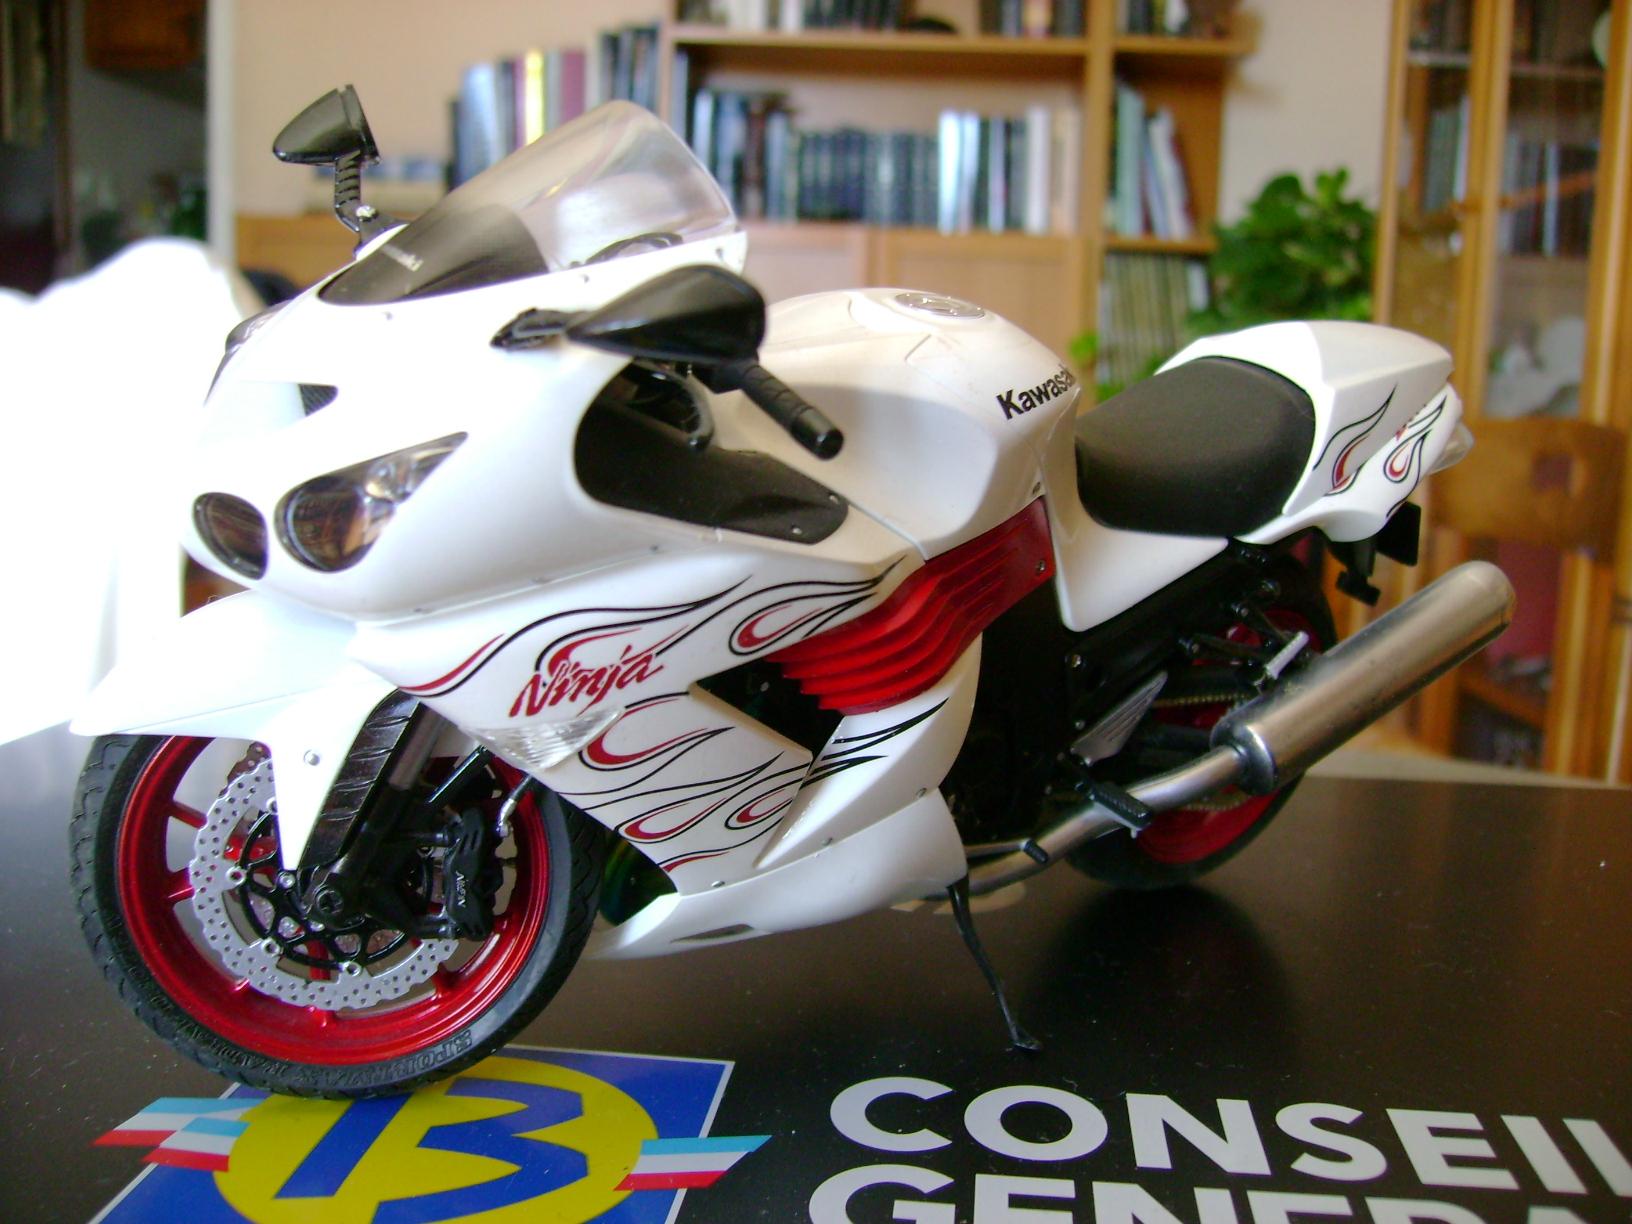 Ninja zx-14 special color edition Dsc02346z